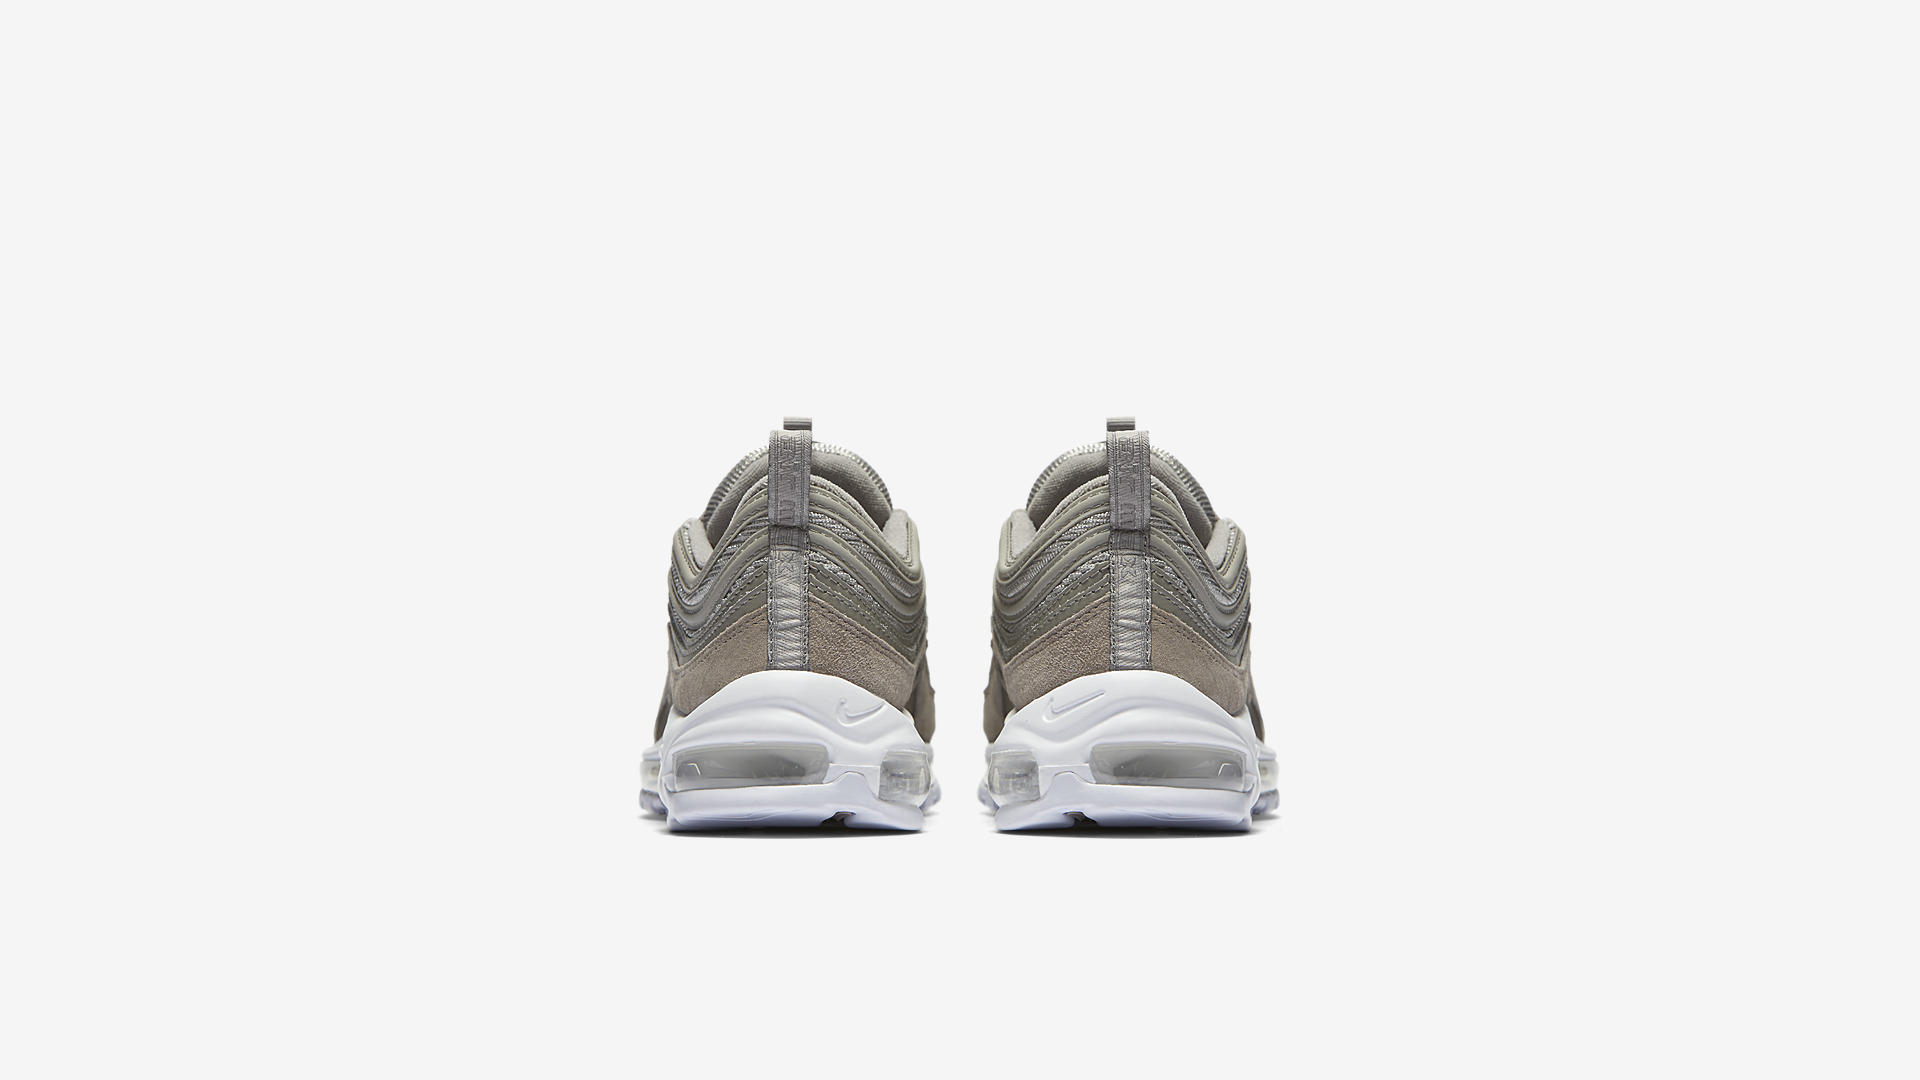 921826 002 Nike Air Max 97 Premium Cobblestone 2